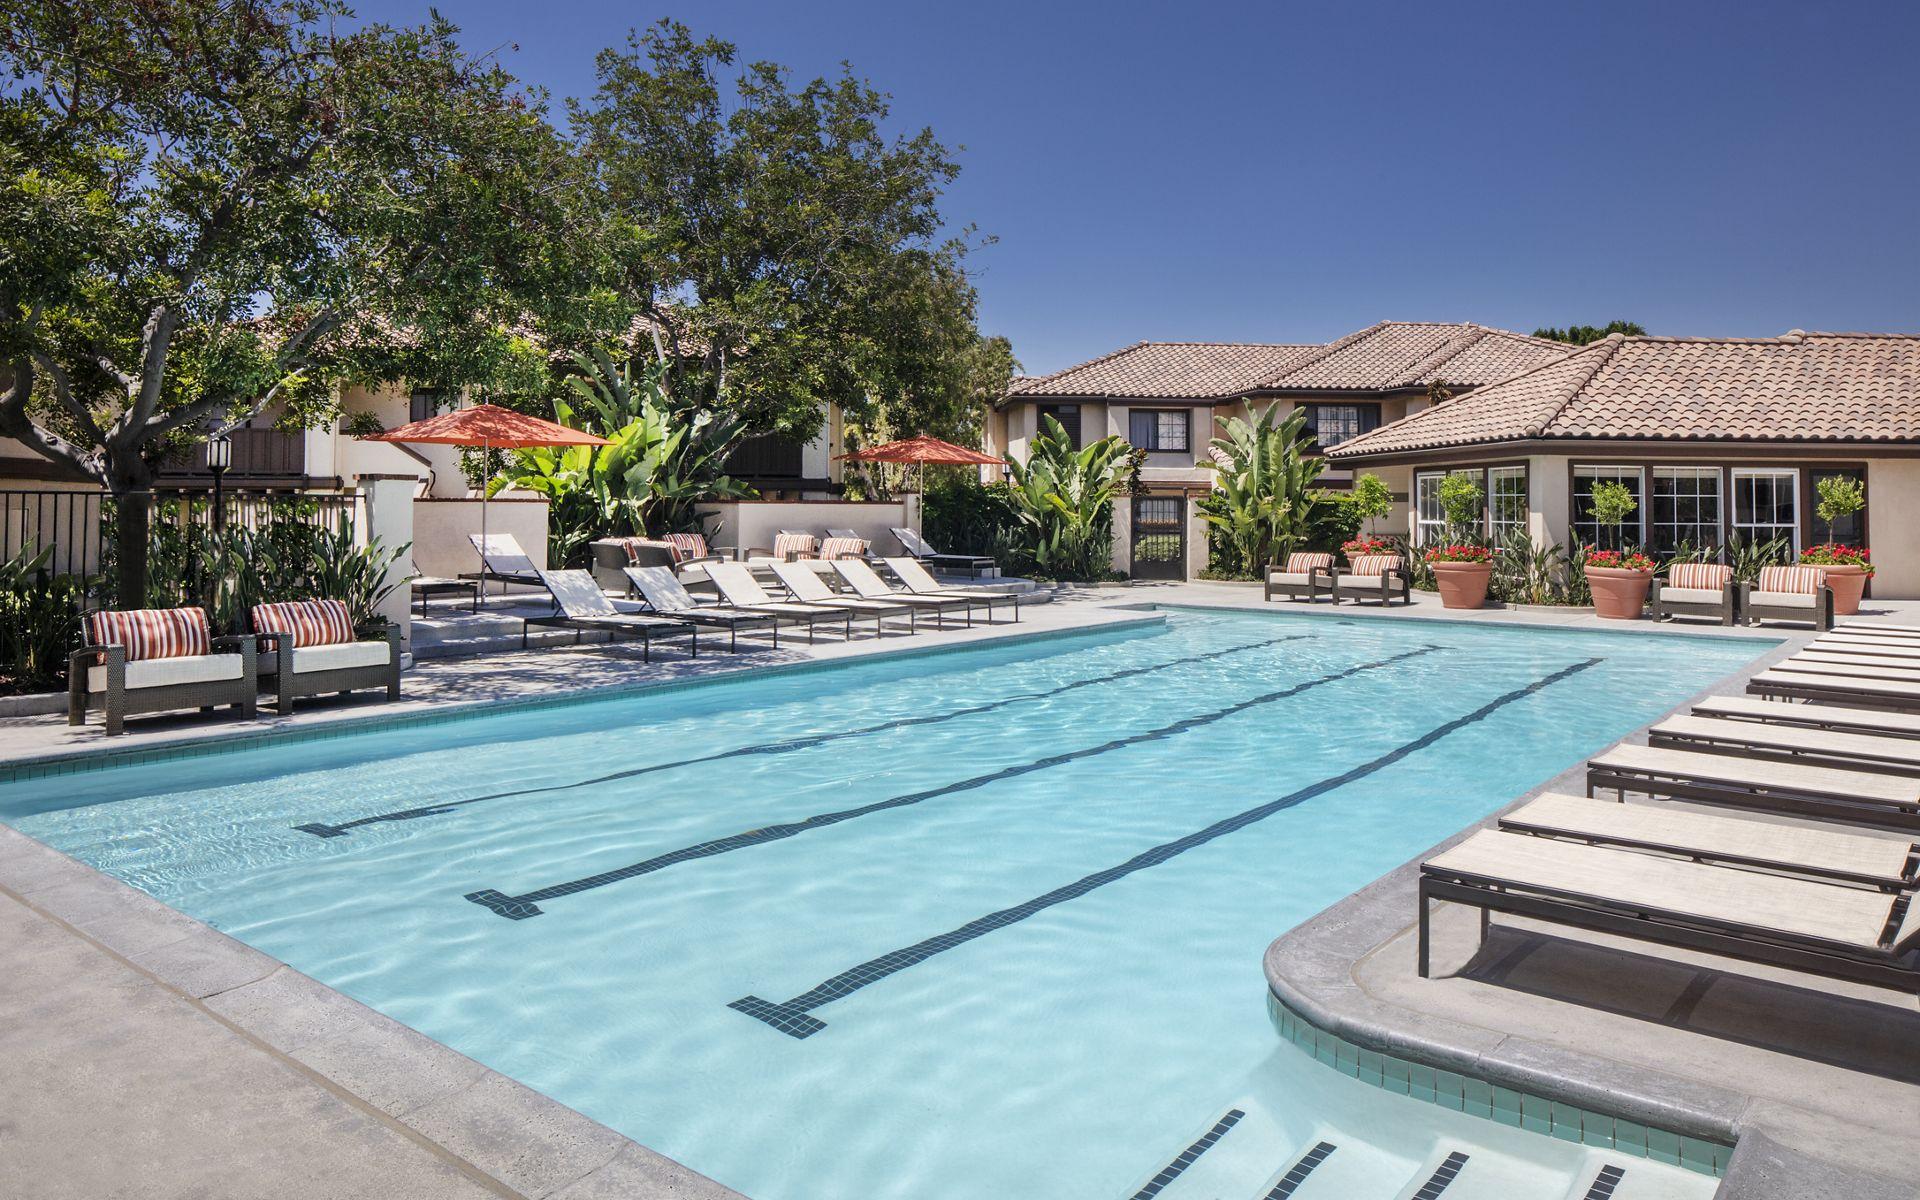 Pool view at Rancho Tierra Apartment Homes in Tustin, CA.